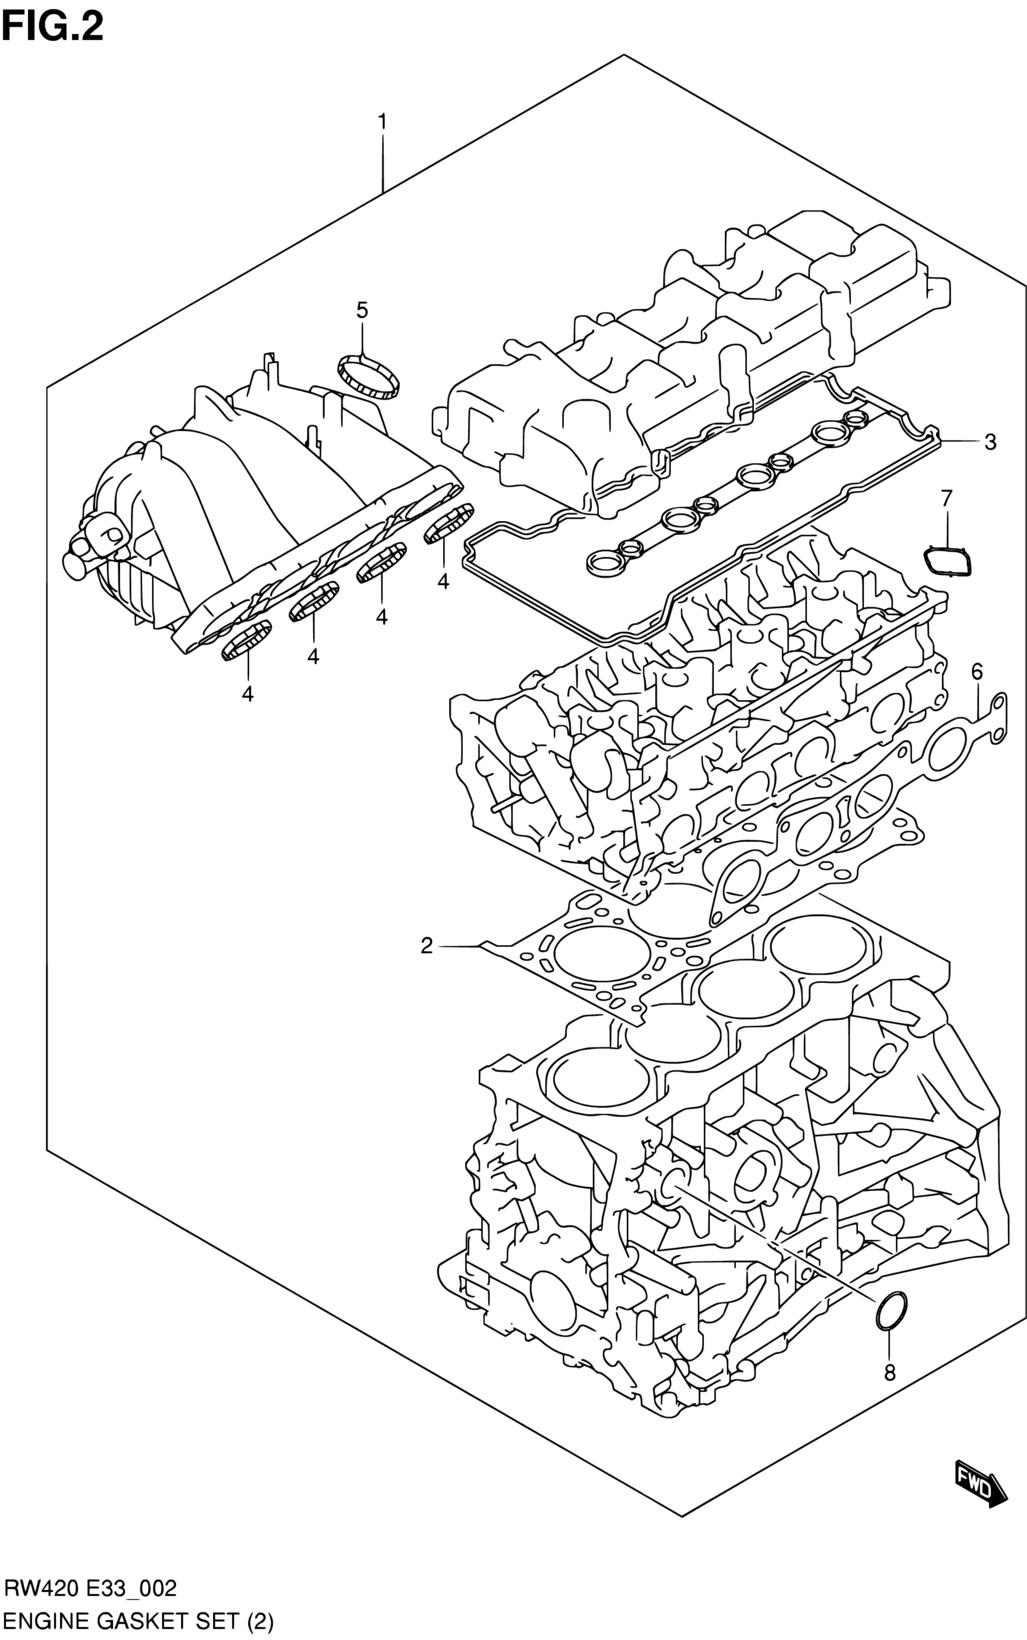 United States Sx4 Rw420 E03e33my 2009 Engine 2 Suzuki Diagram Parts